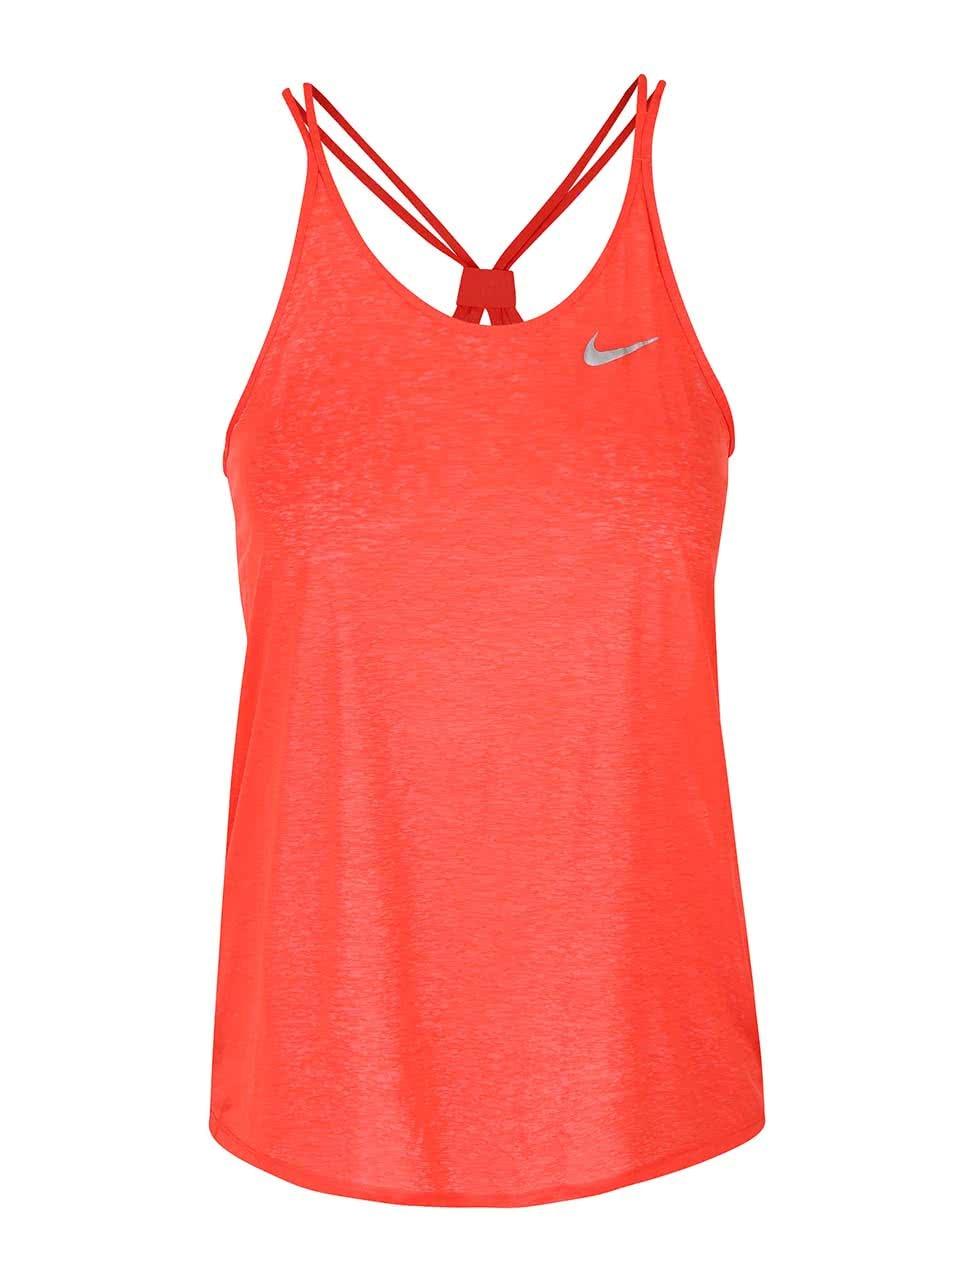 Červené dámske tielko Nike Dri-Fit Cool ... 50a09e2f6a0